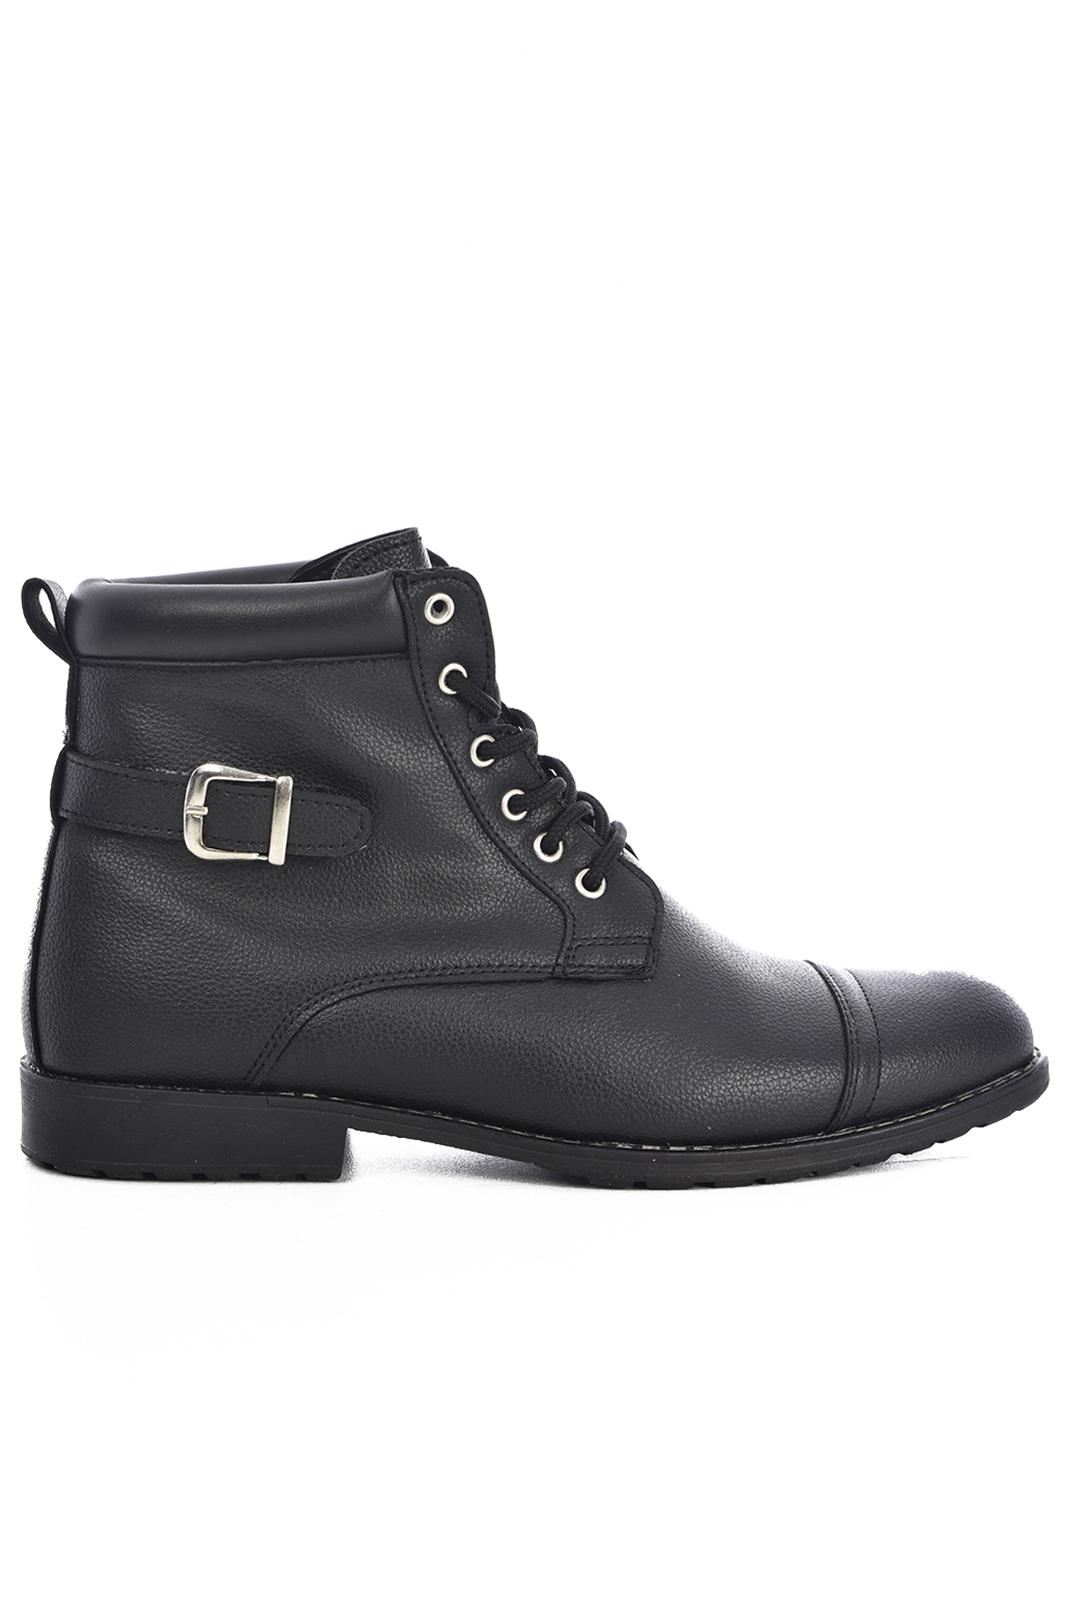 Chaussures de ville  Galax T20 NOIR